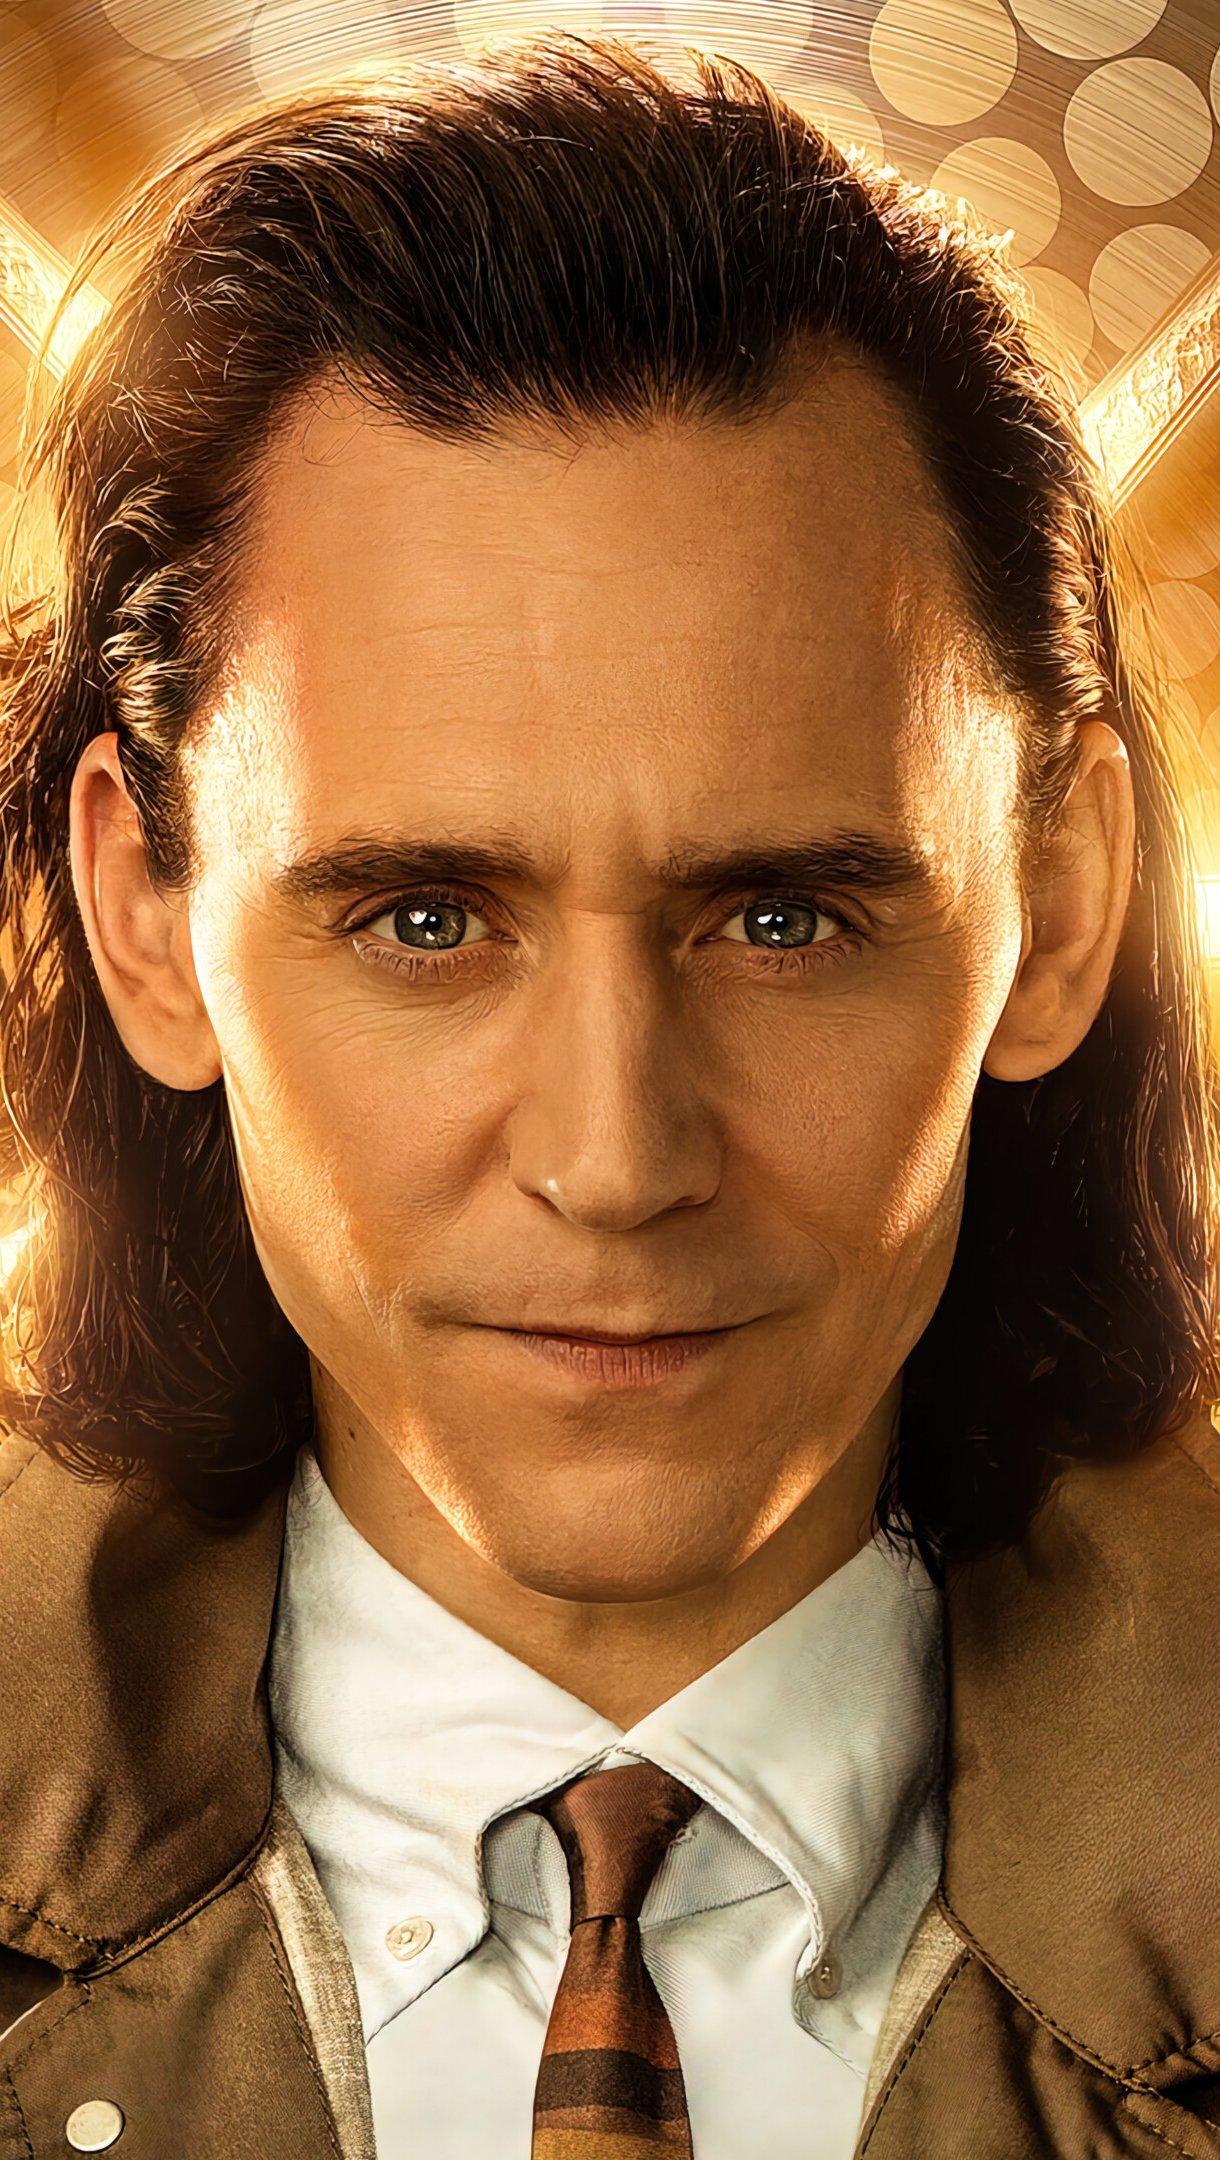 Wallpaper Loki Tom Hiddleston Loki Series Vertical